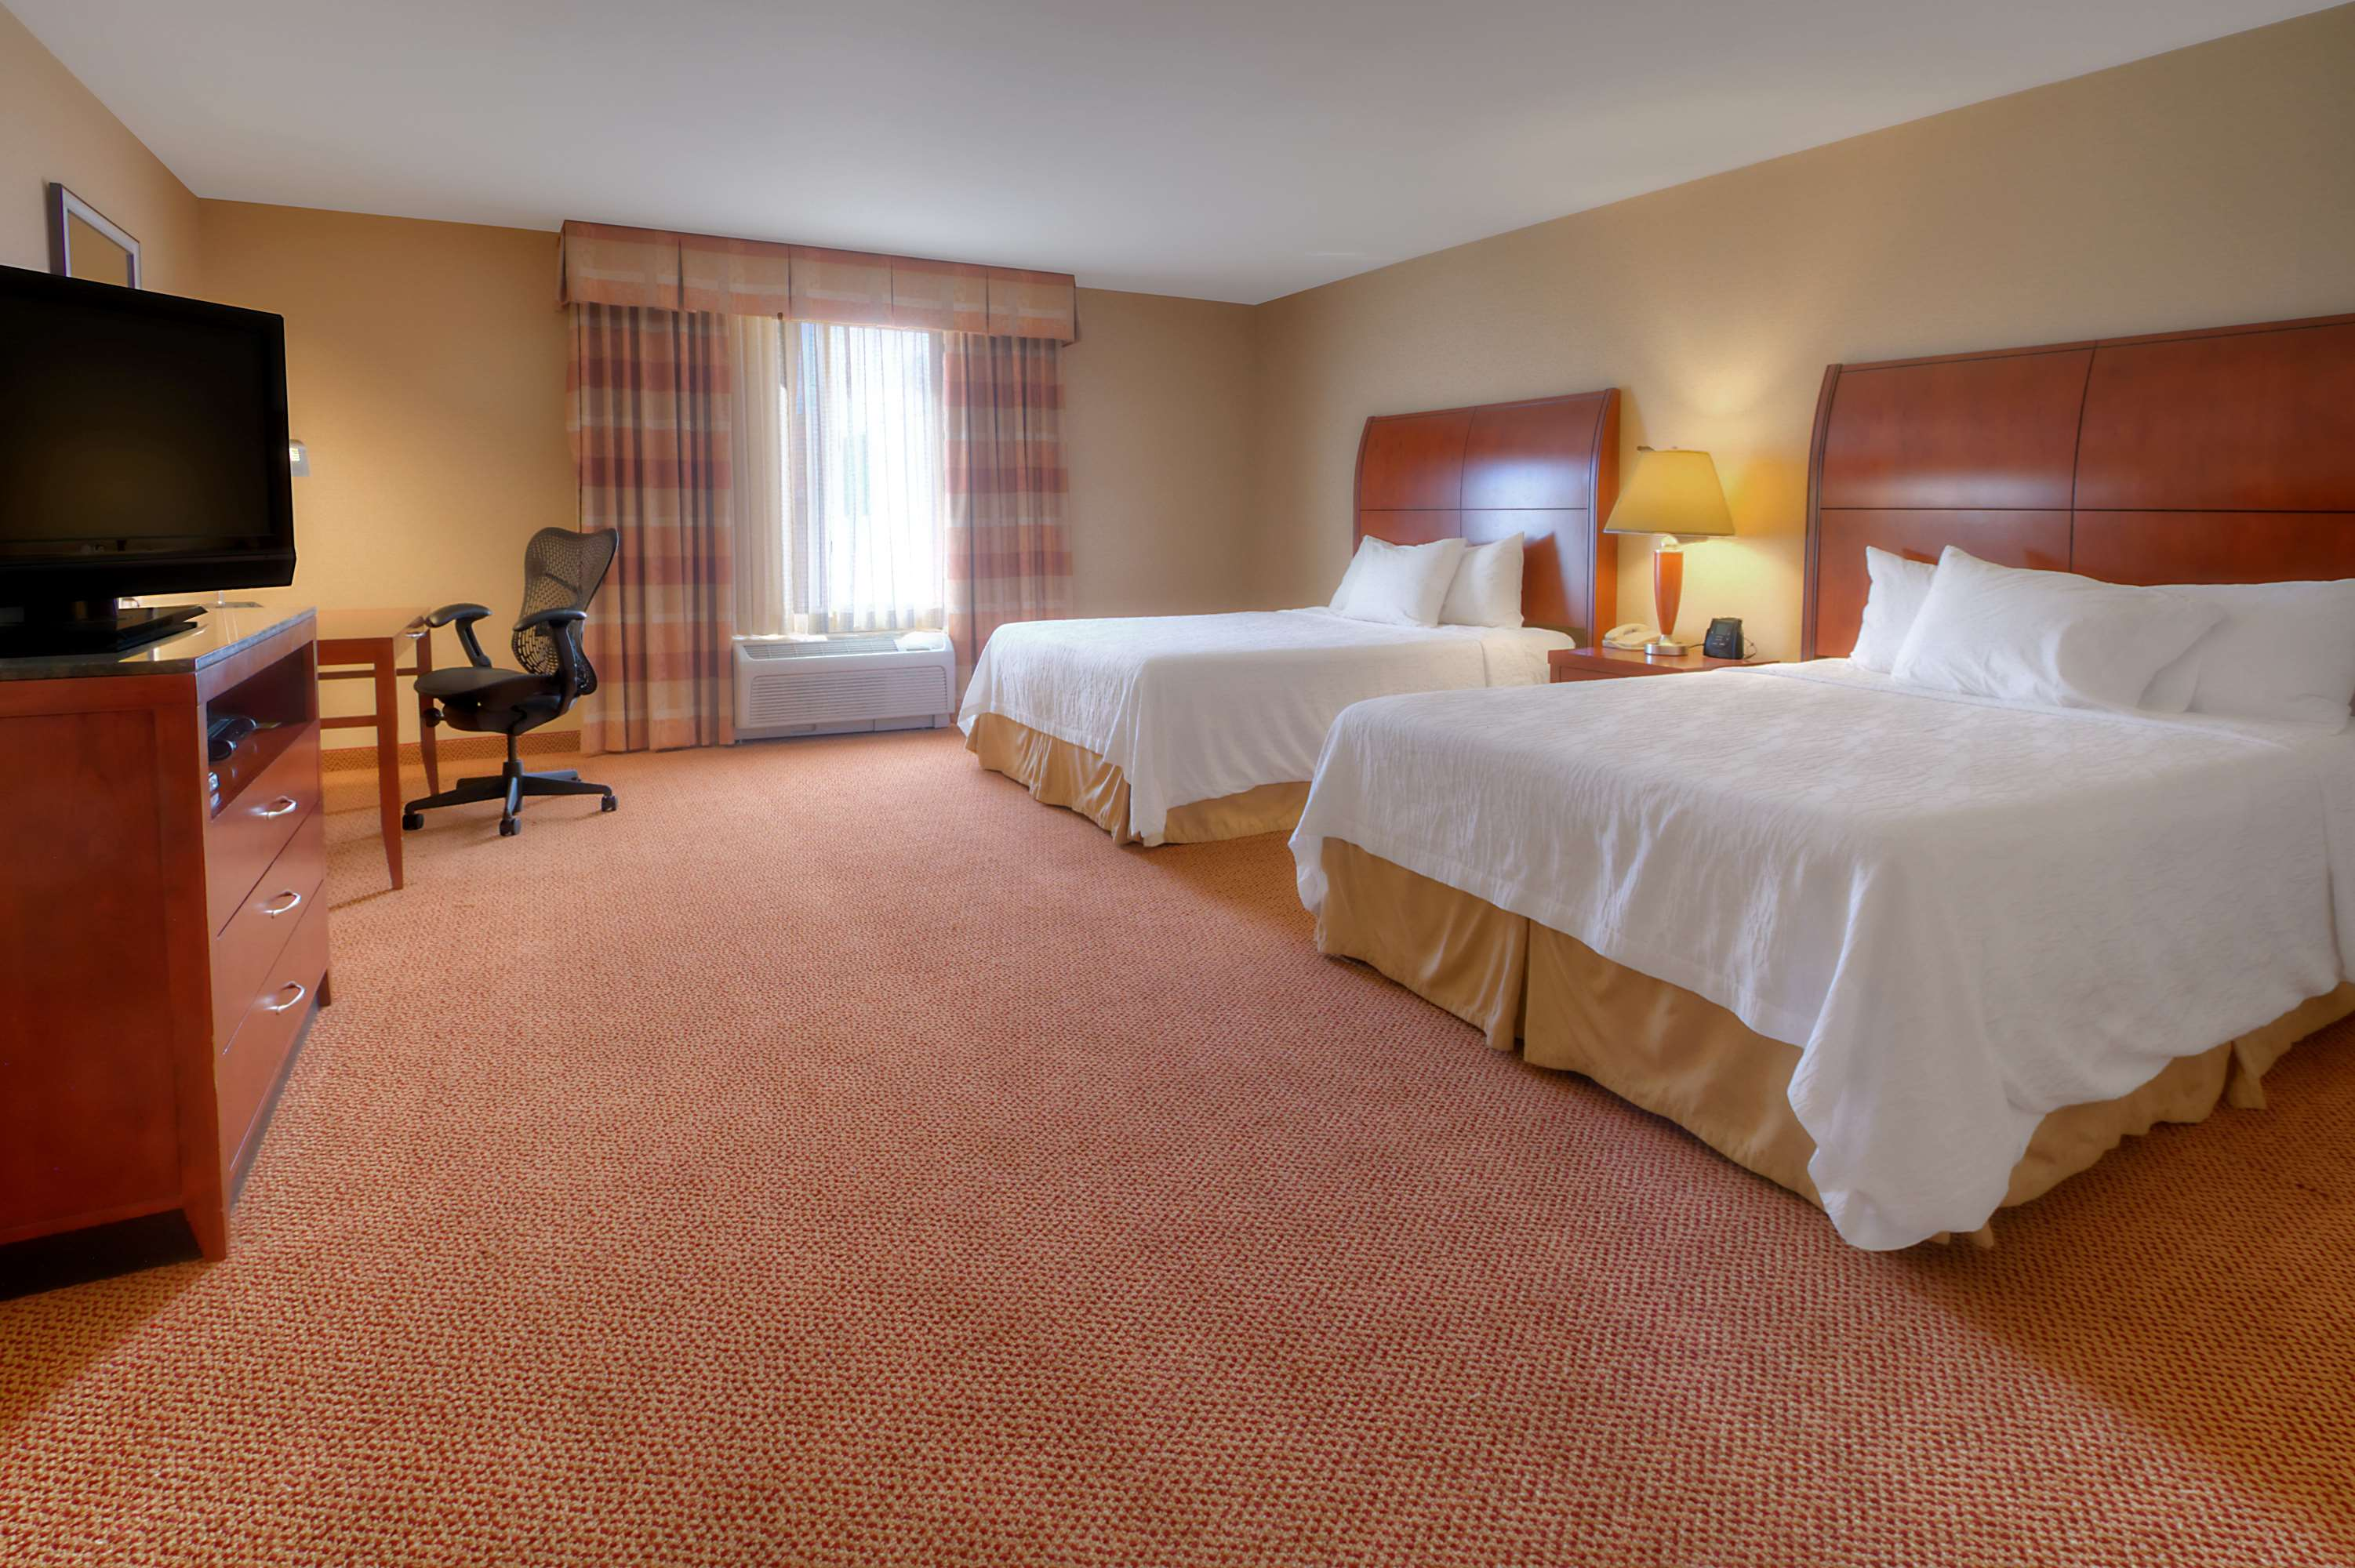 Hilton Garden Inn Great Falls image 18